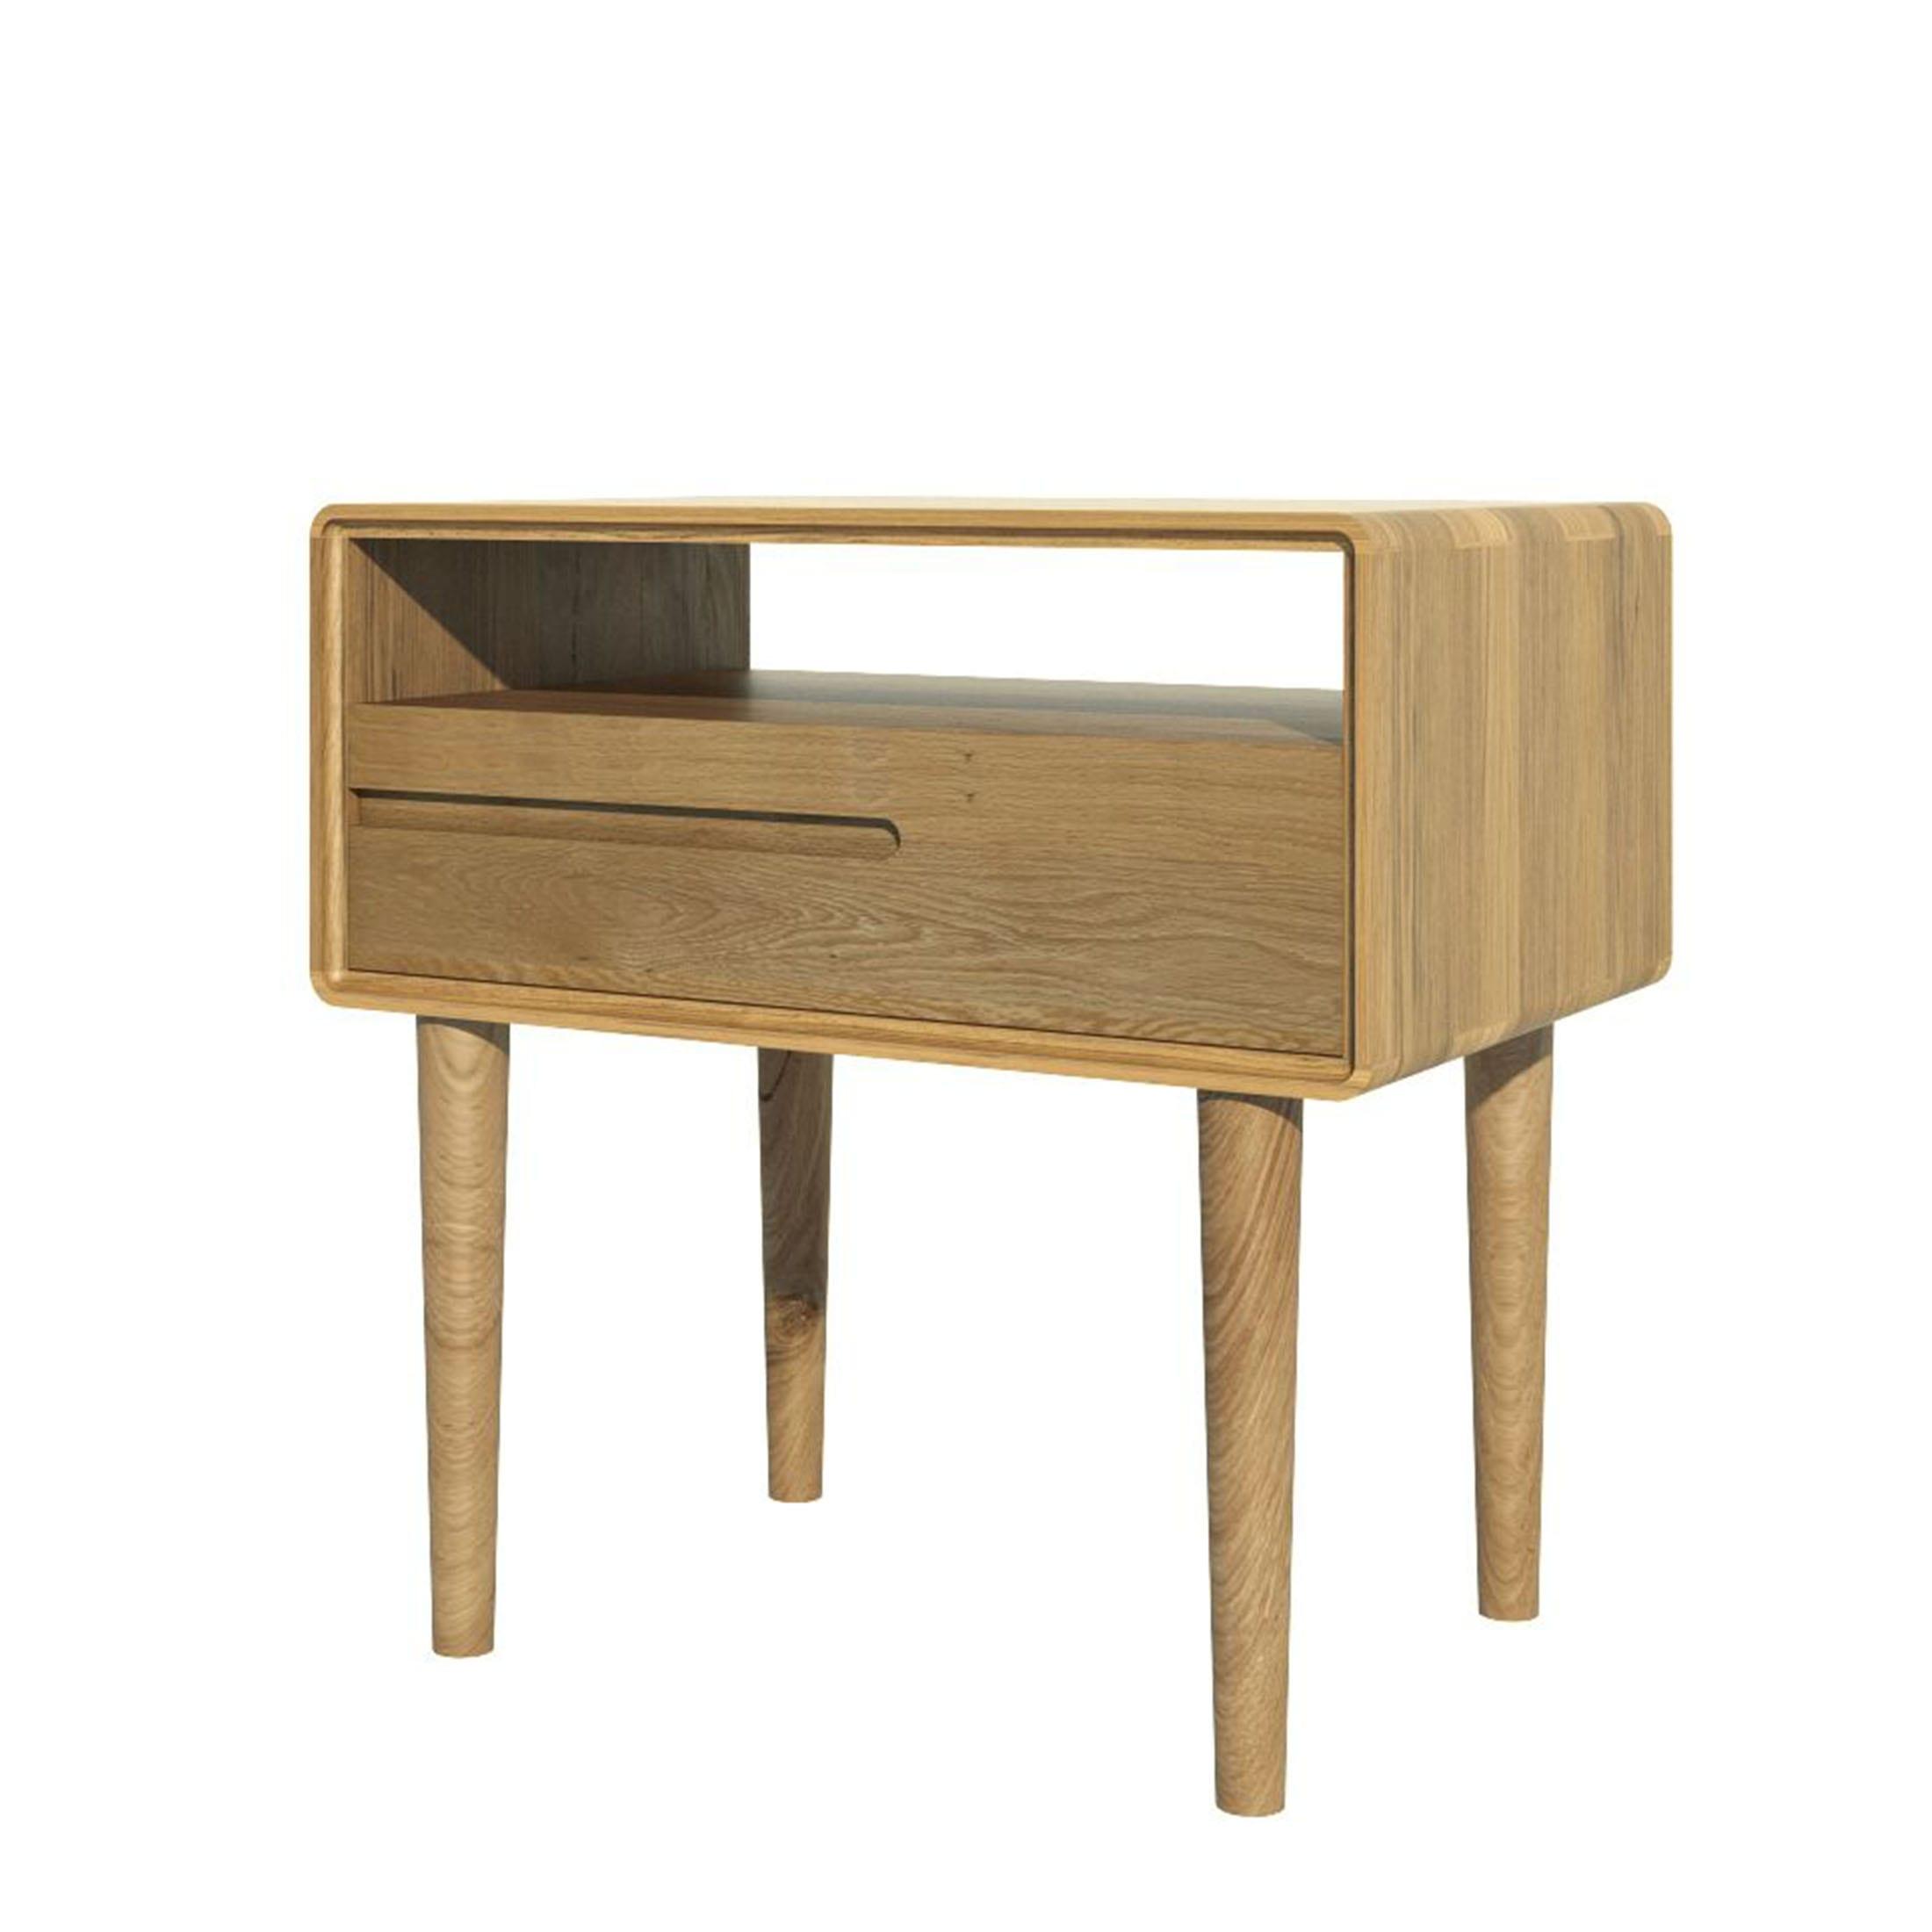 Scantic oak coffee table retro style